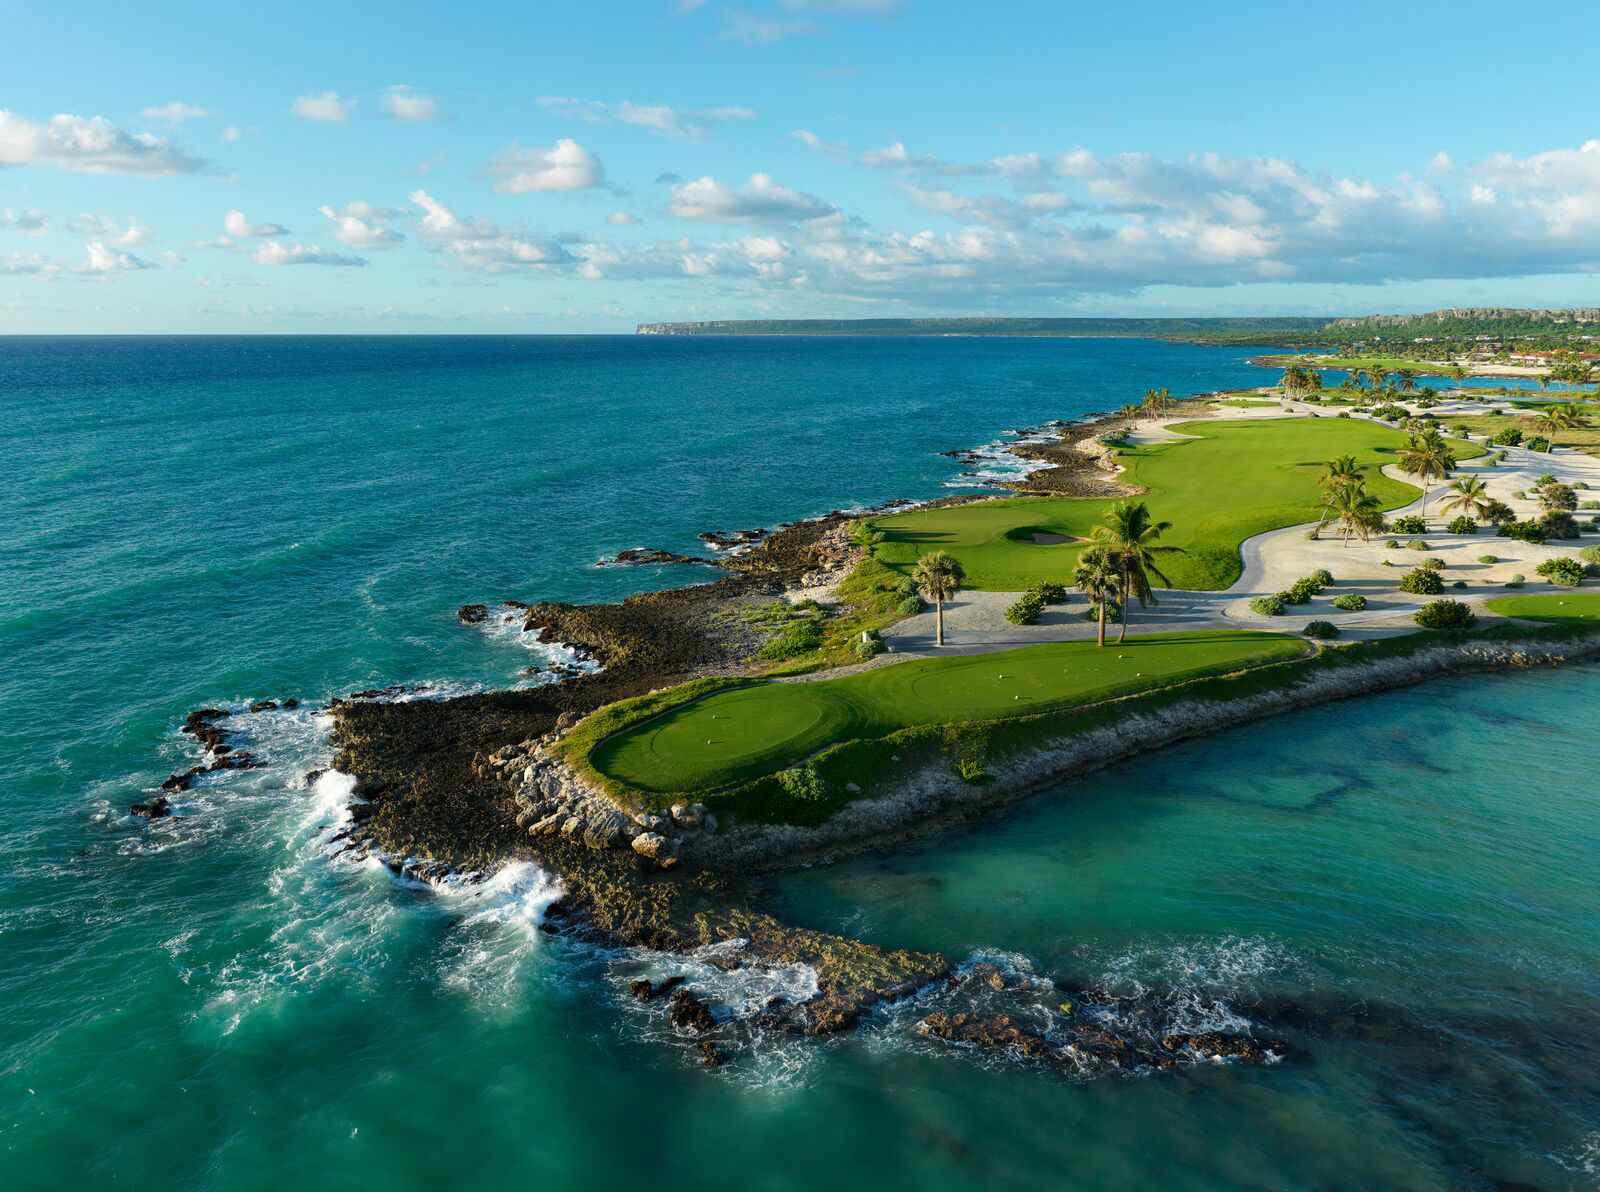 The third hole at the newly renovated Punta Espada Golf Club